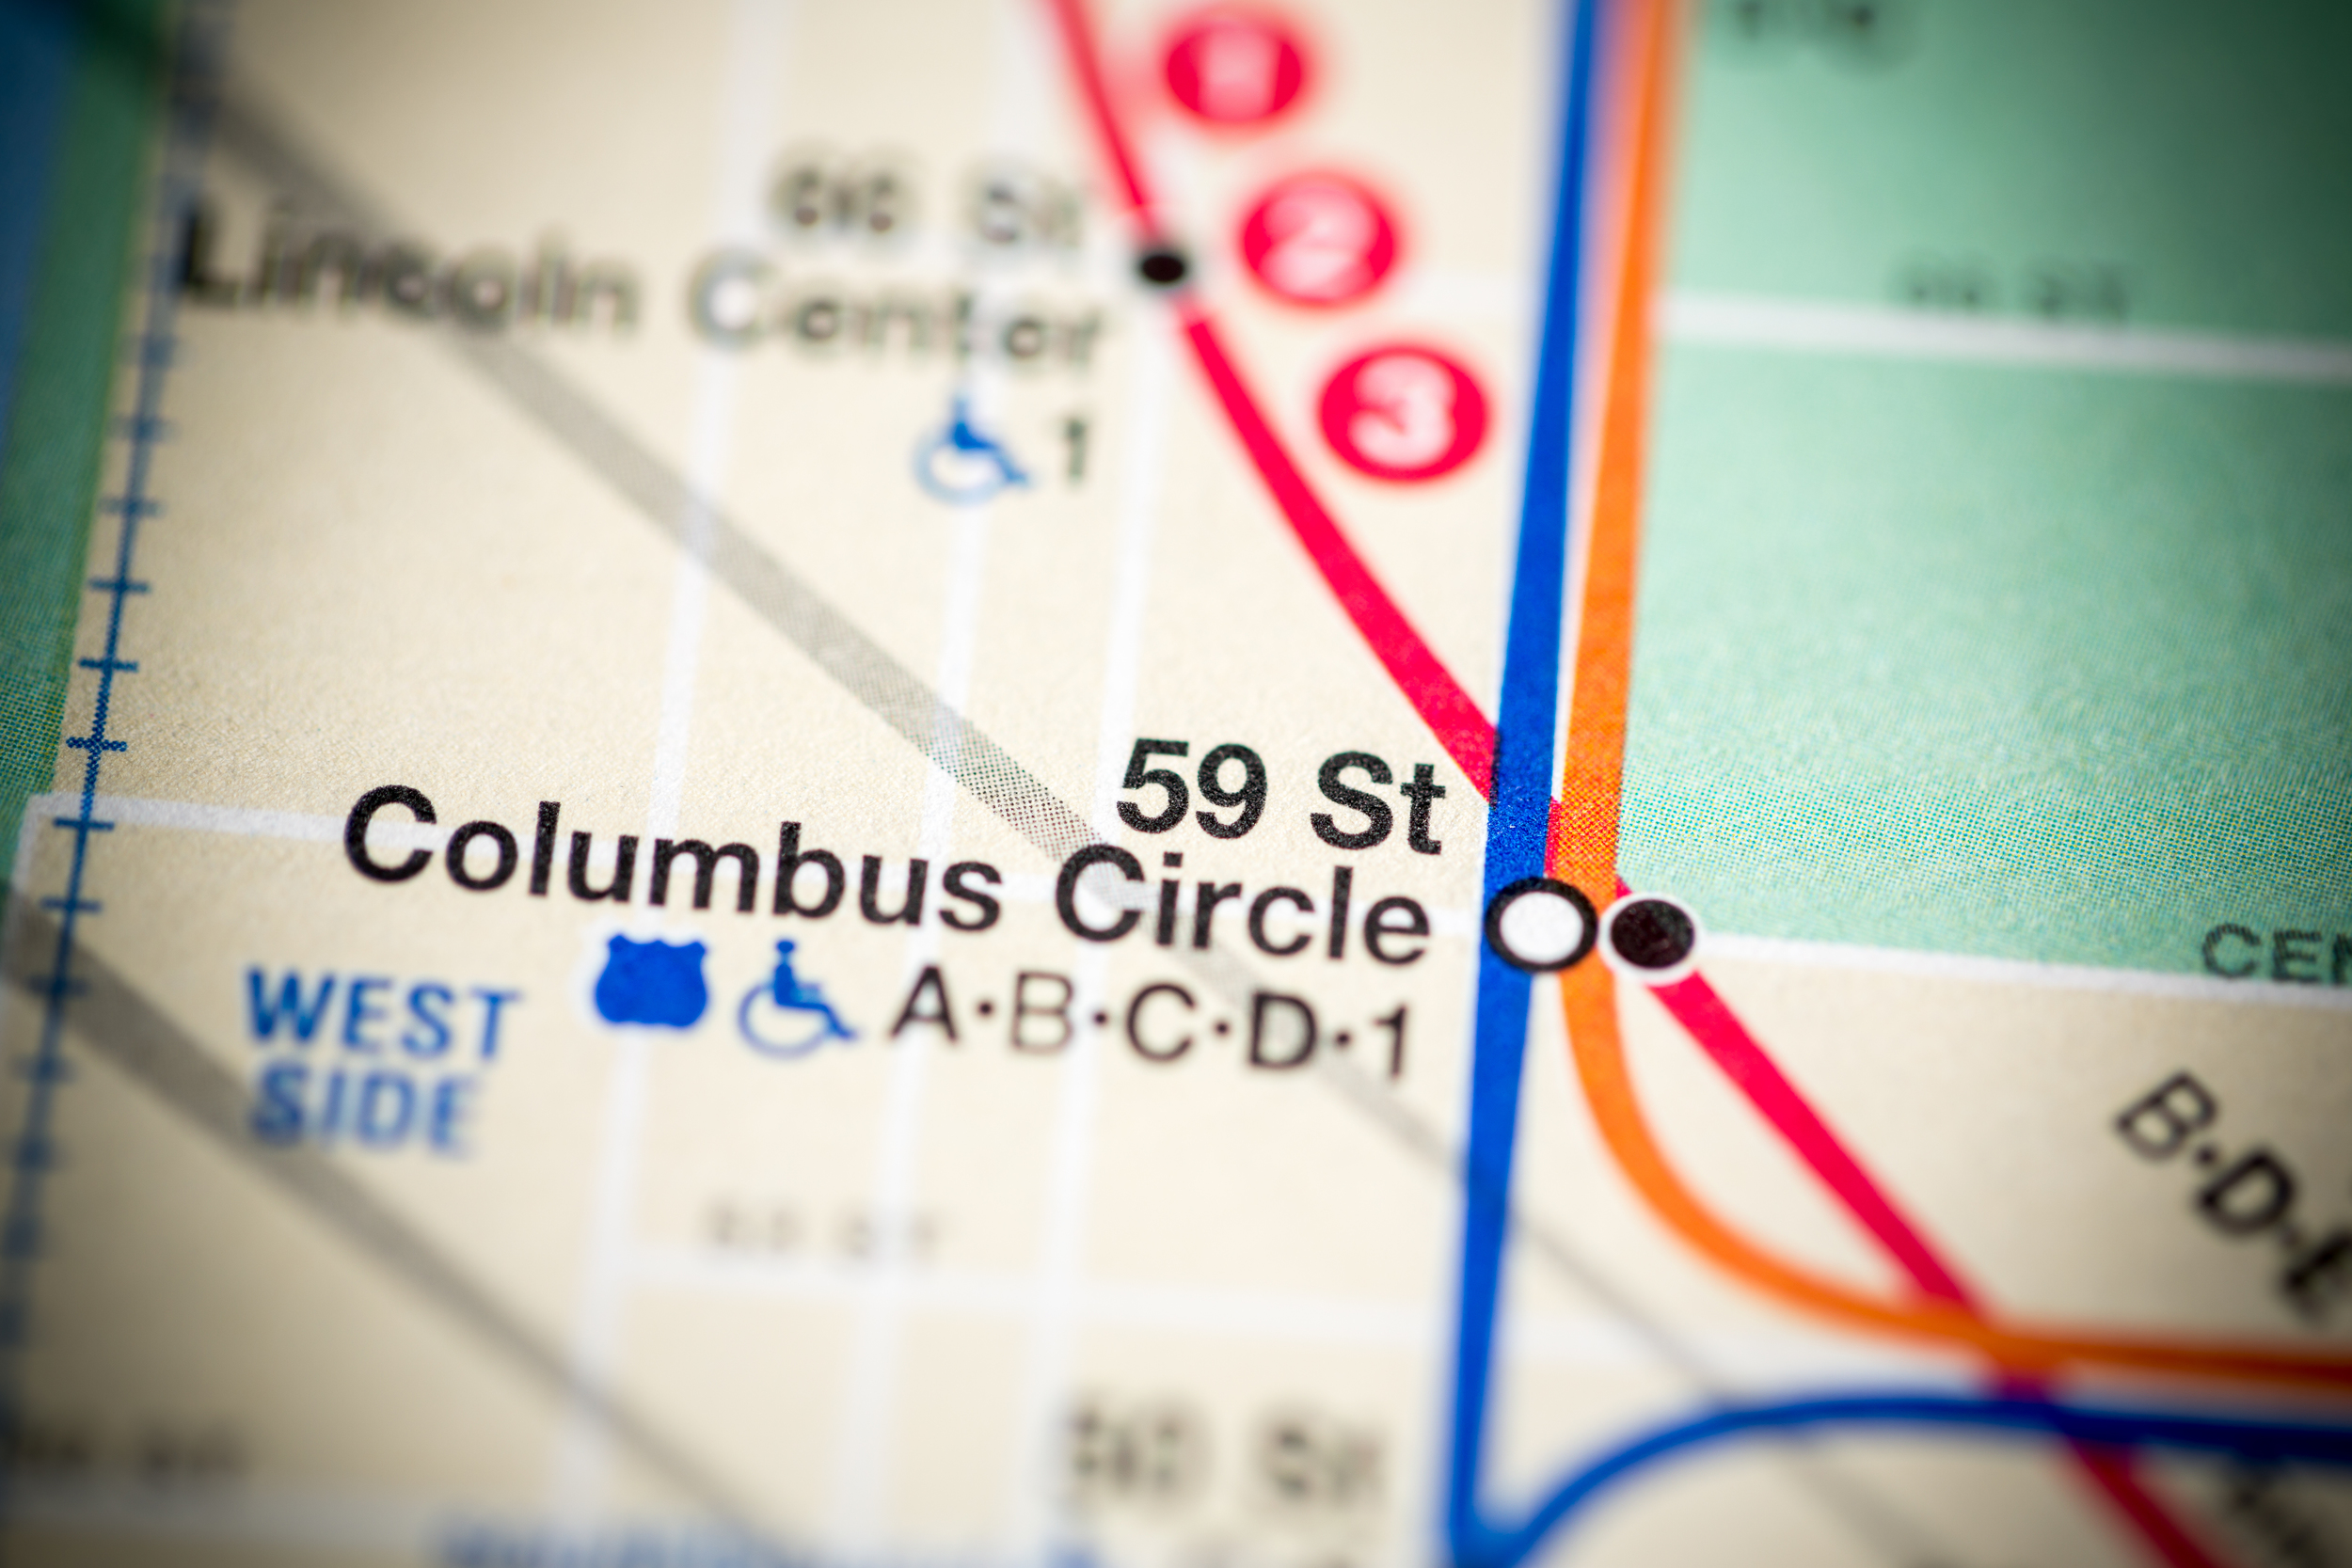 subway map of columbus circle